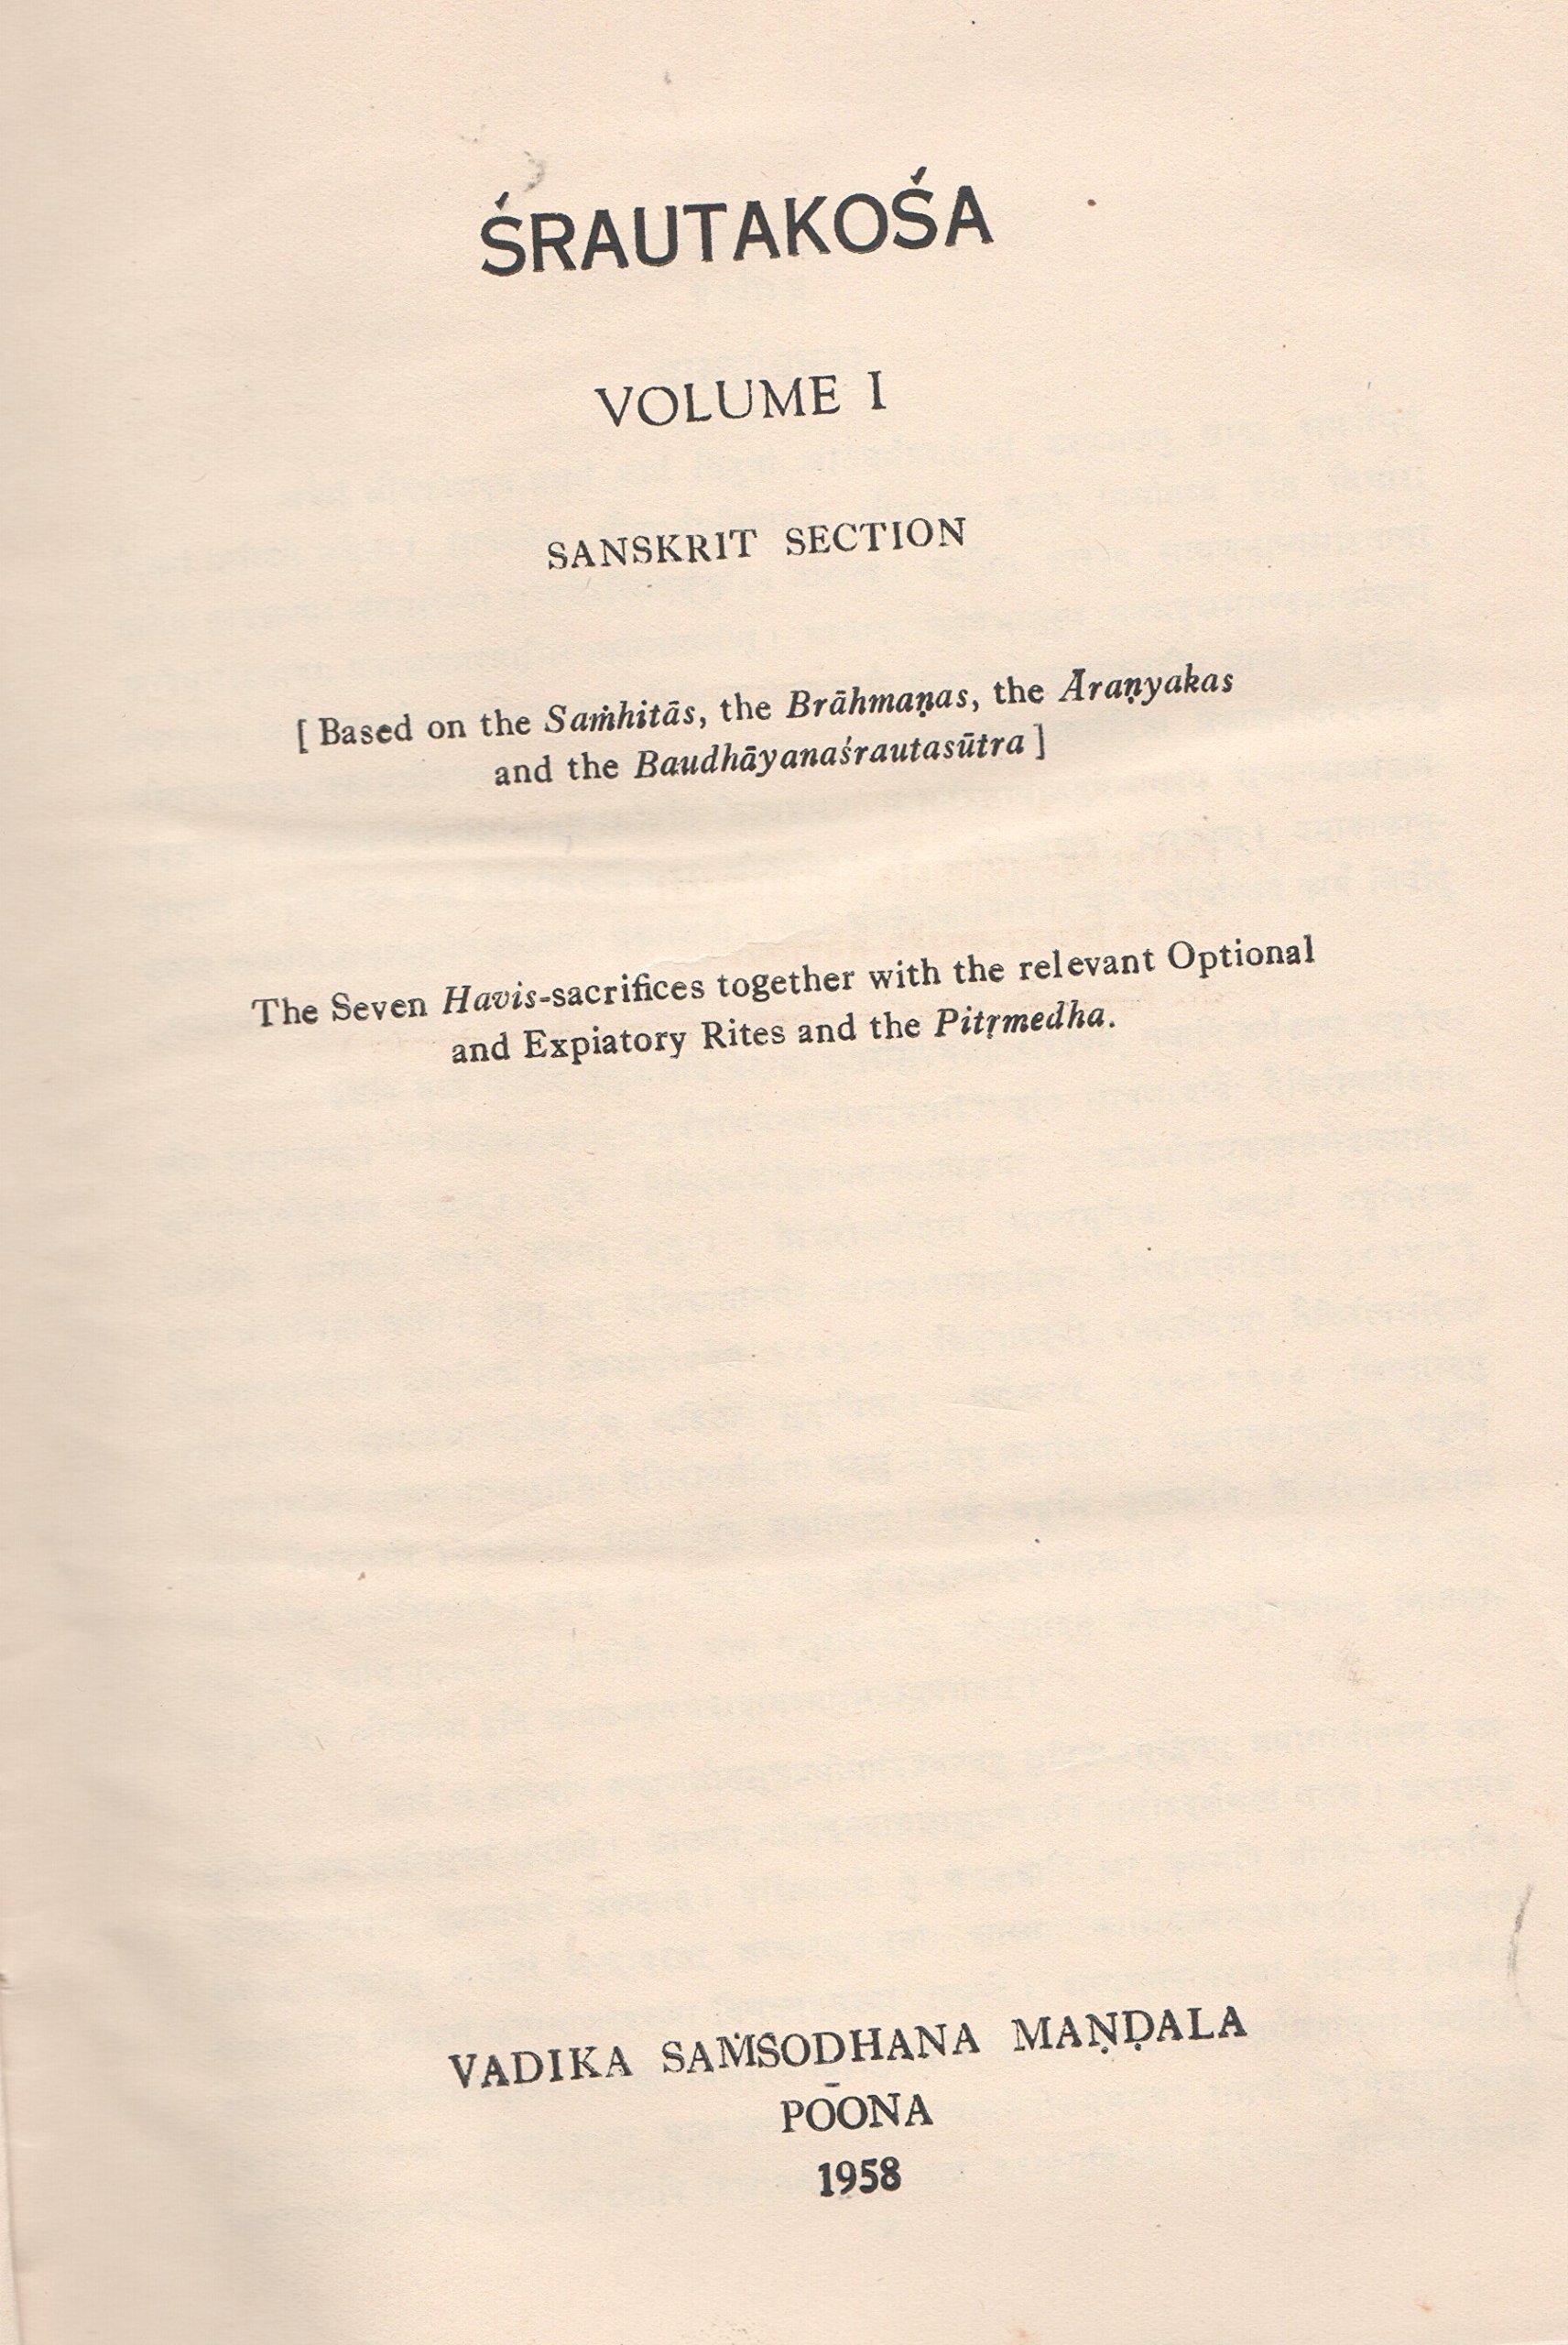 Srautakosa Vol I Sanskrit Section ebook